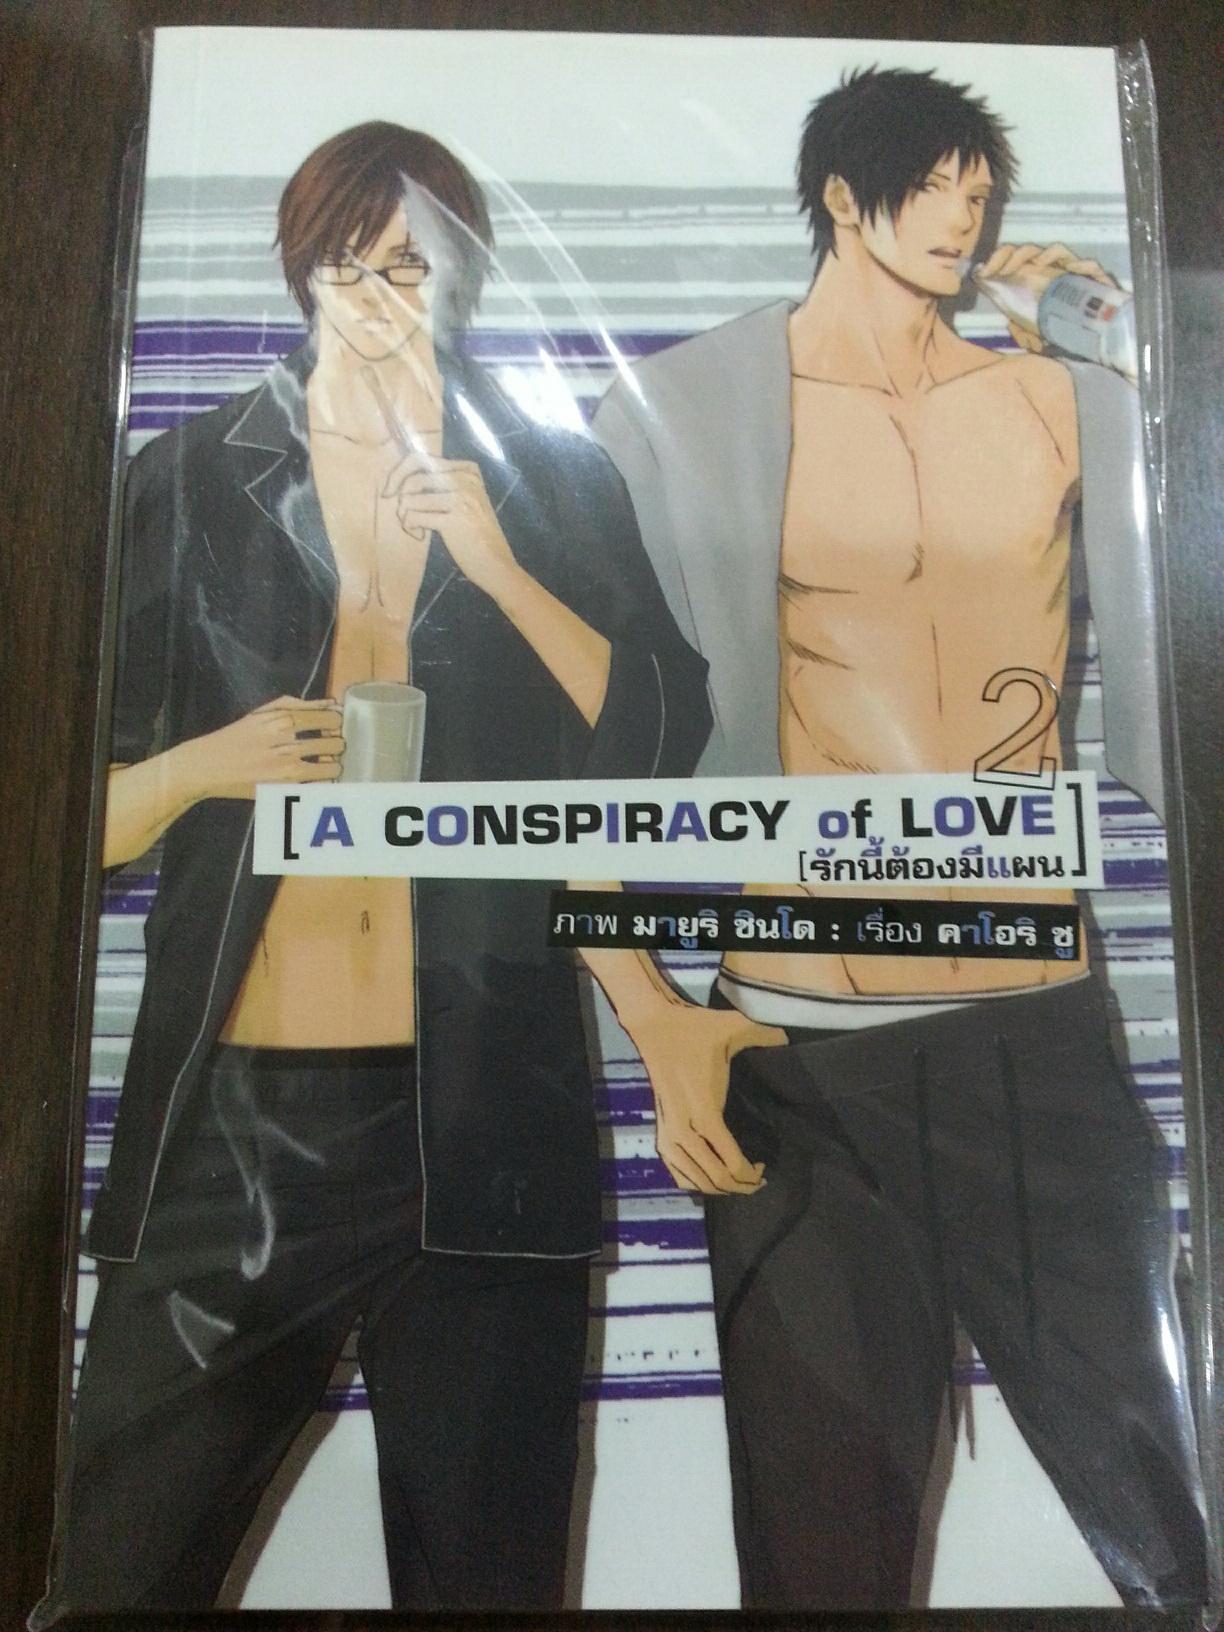 A Conspiracy of love : รักนี้ต้องมีแผน เล่ม 2 มัดจำ 250 ค่าเช่า 50B.